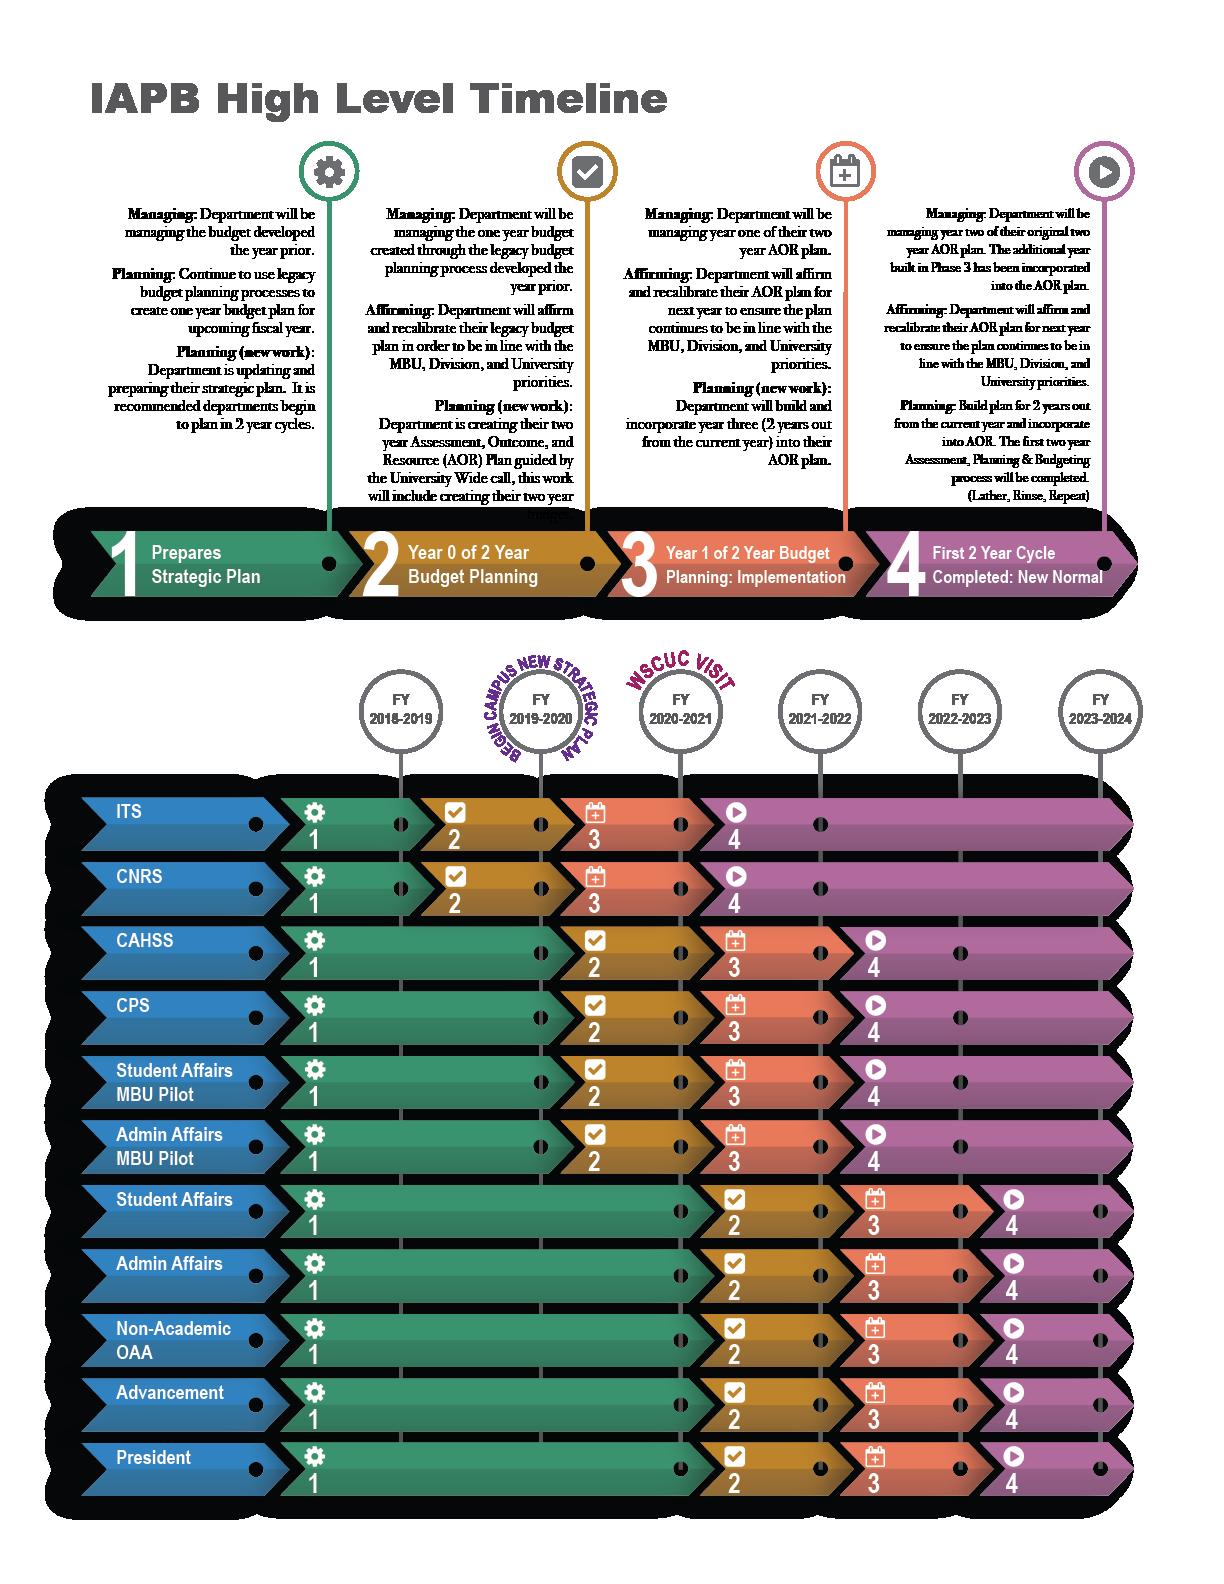 IAPB High Level Timeline